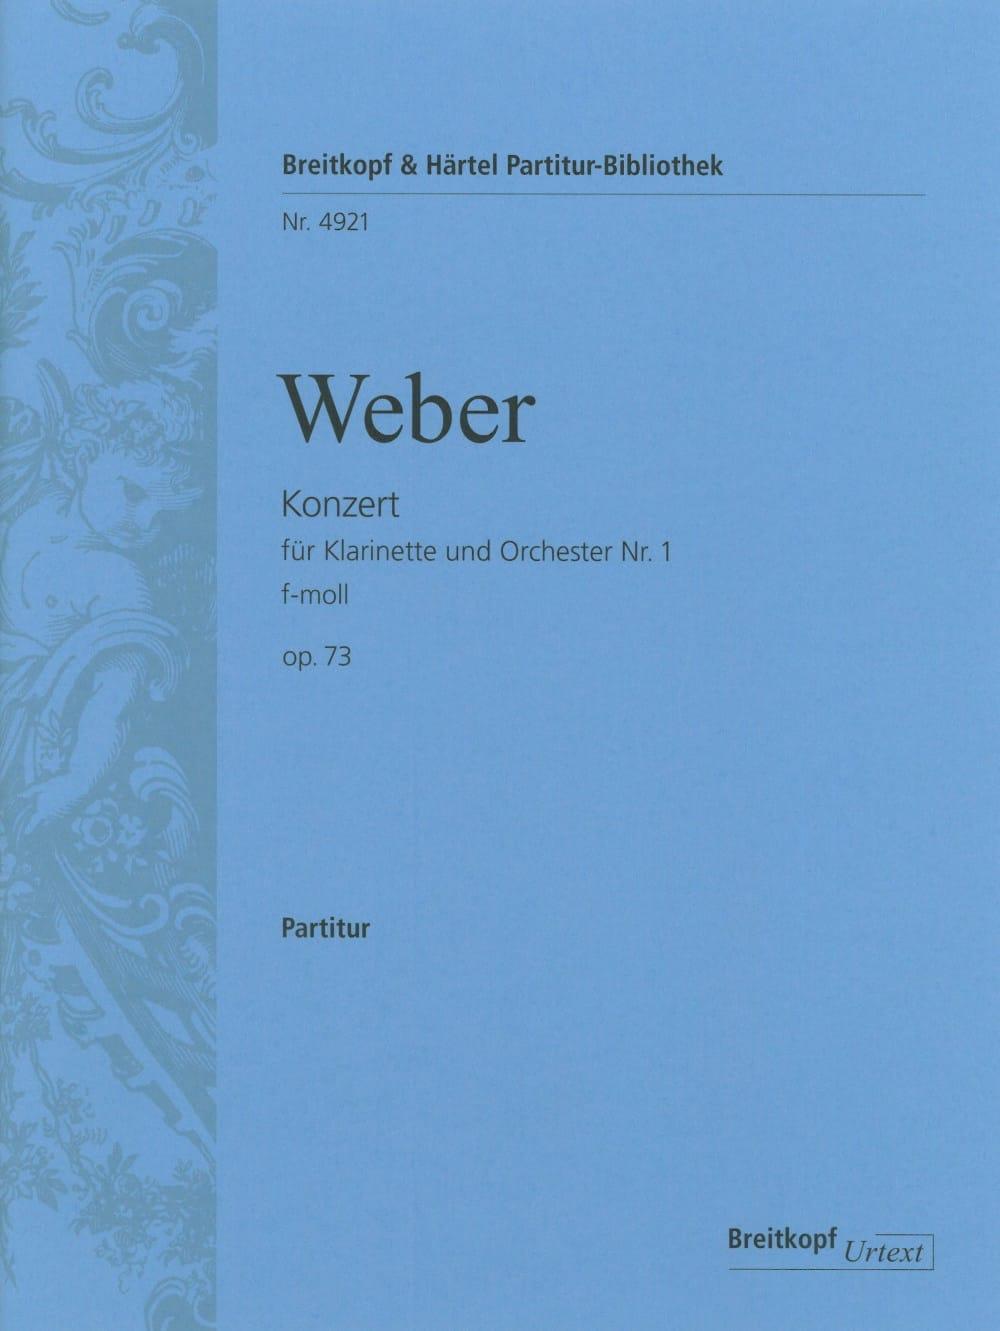 Carl Maria von Weber - Klarinettenkonzert Nr. 1 f-moll op. 73 - Partitur - Partition - di-arezzo.co.uk